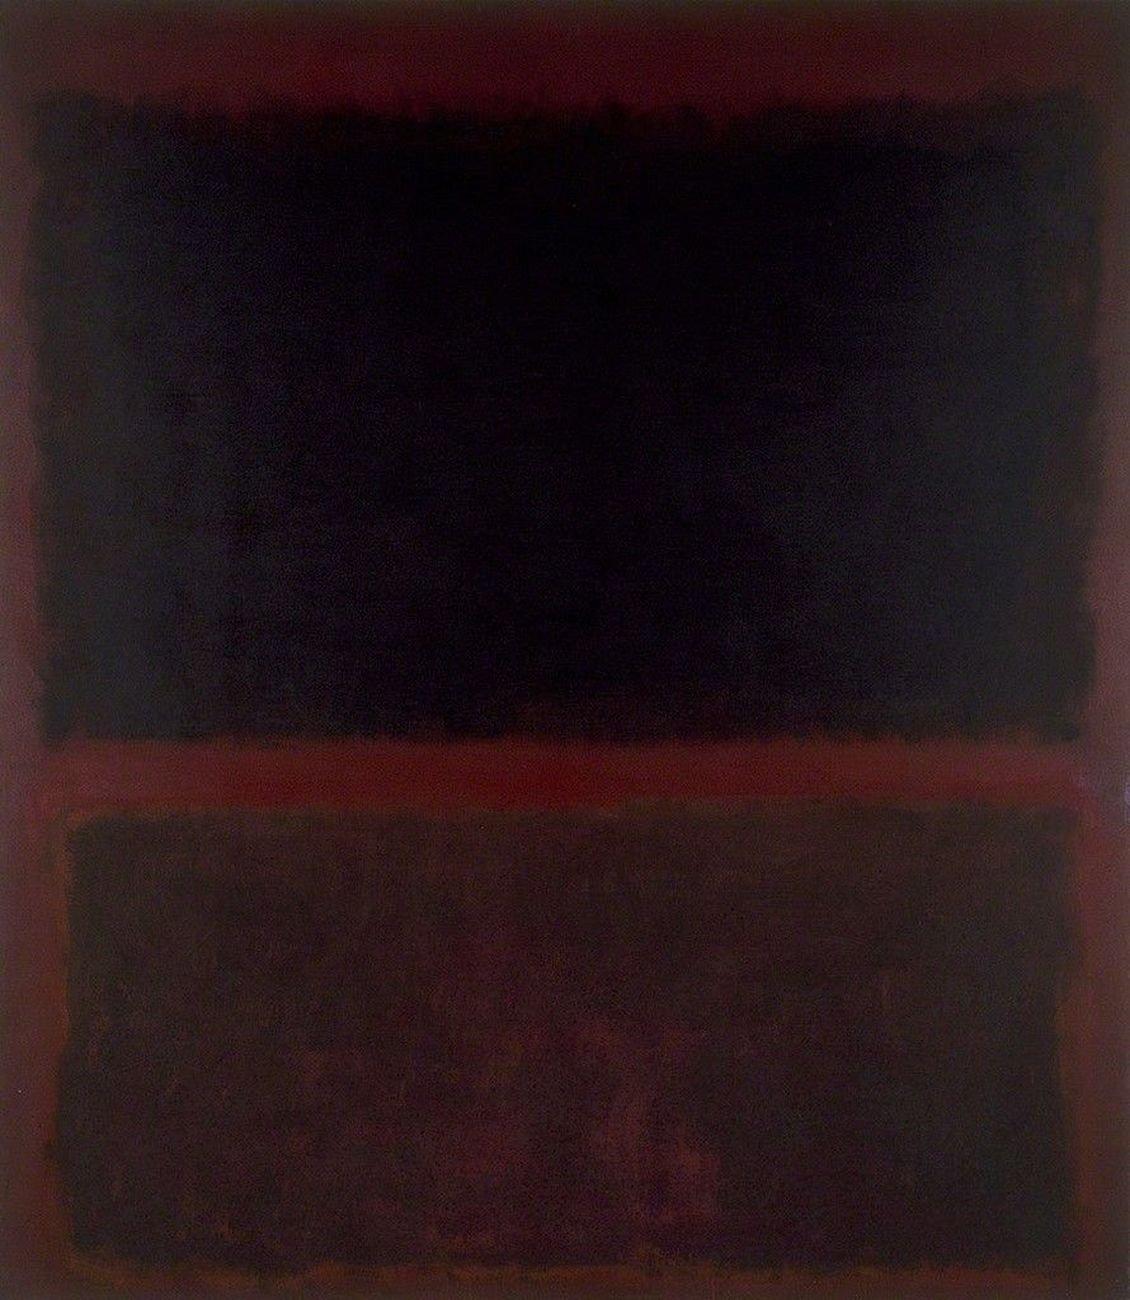 Mark Rothko, Black on Dark Sienna on Purple, 1960. MOCA, Los Angeles © 2012 Artists Rights Society (ARS), New York